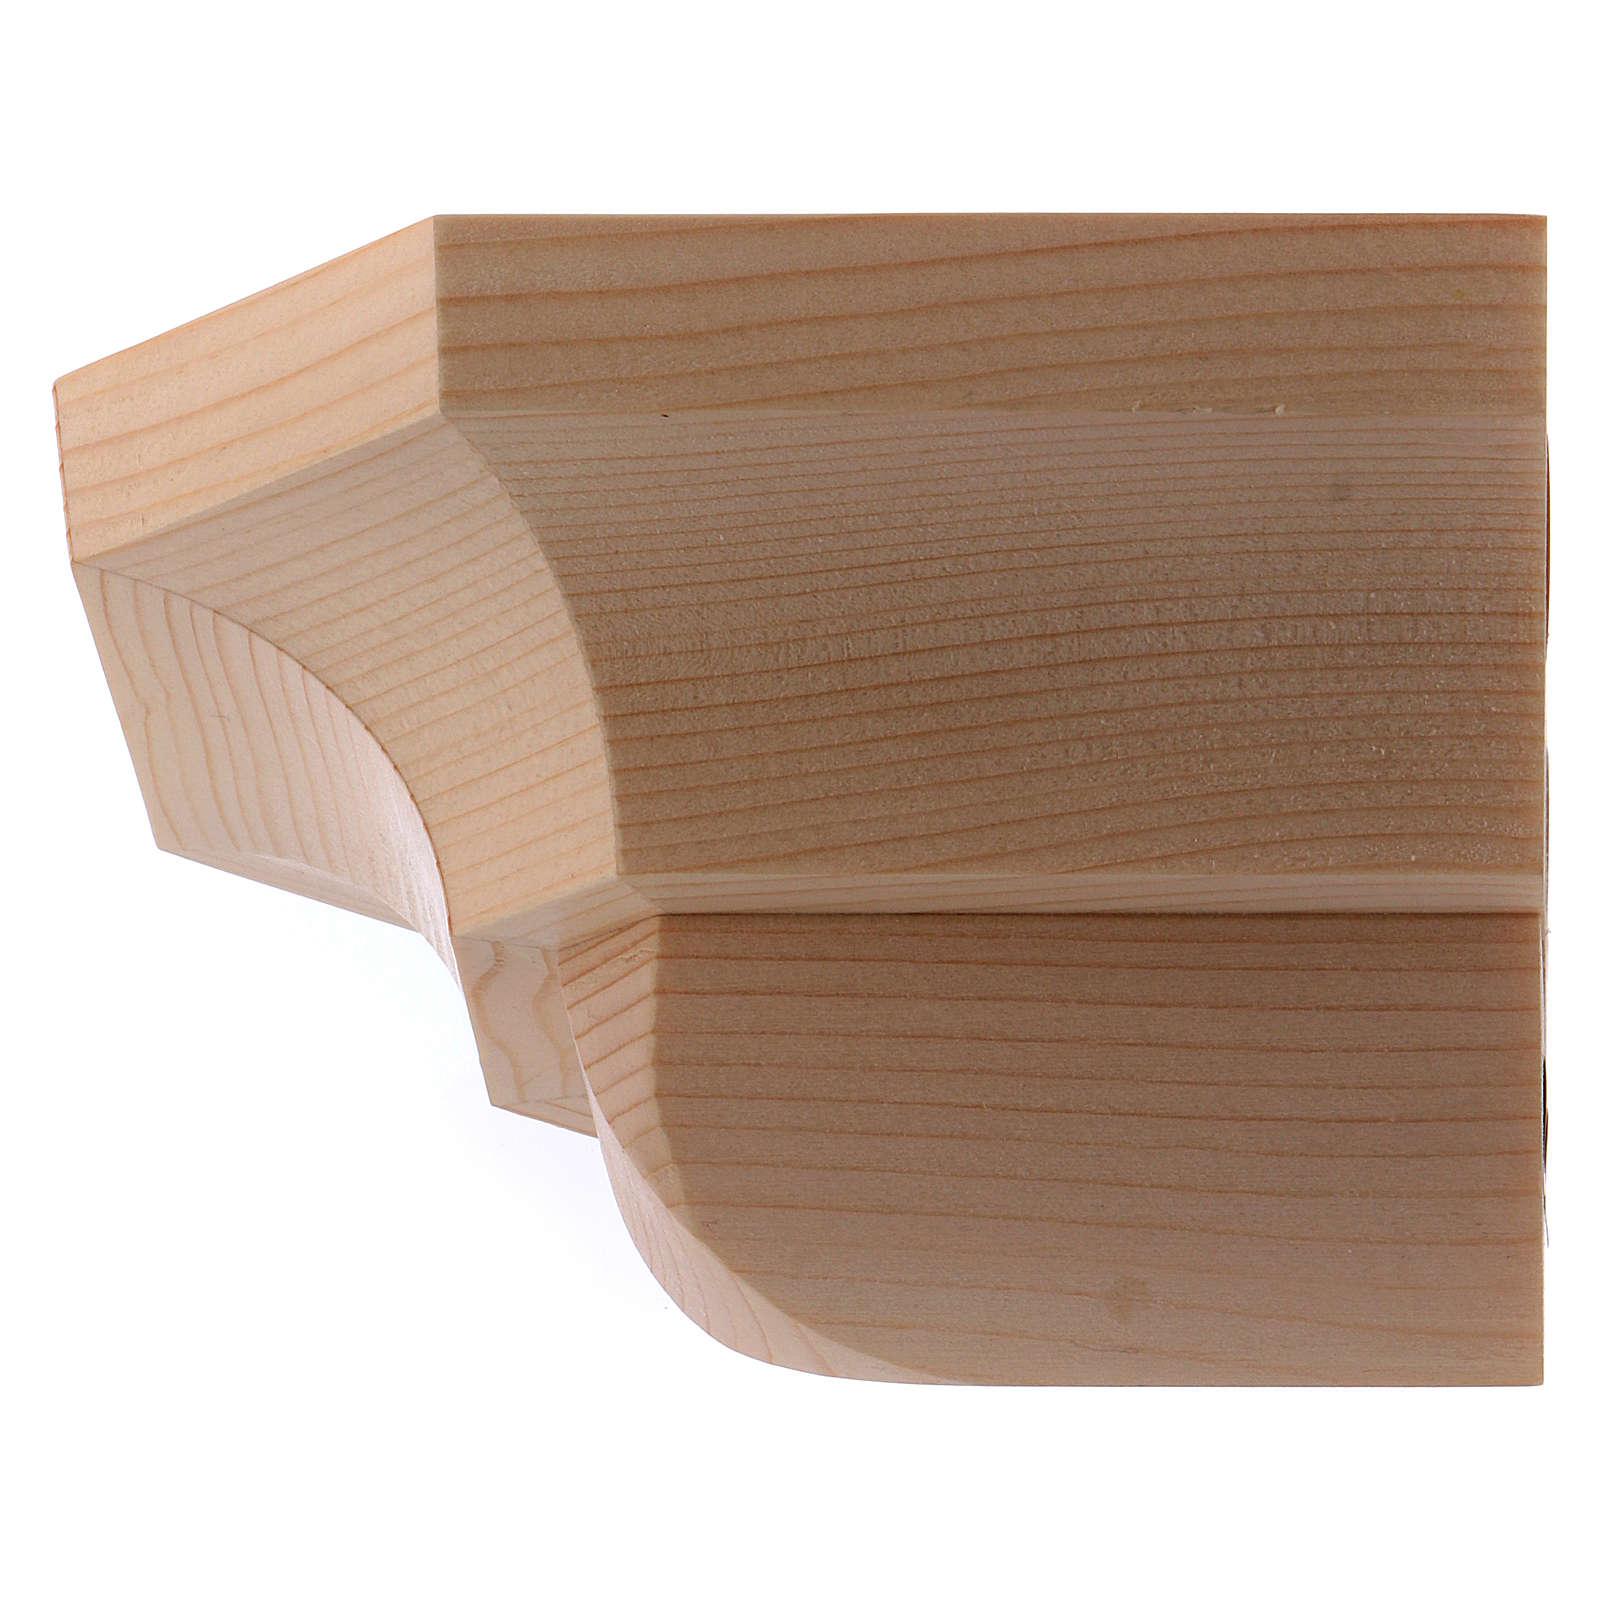 Ménsula estilo gótico de madera natural encerada 12x14cm 4